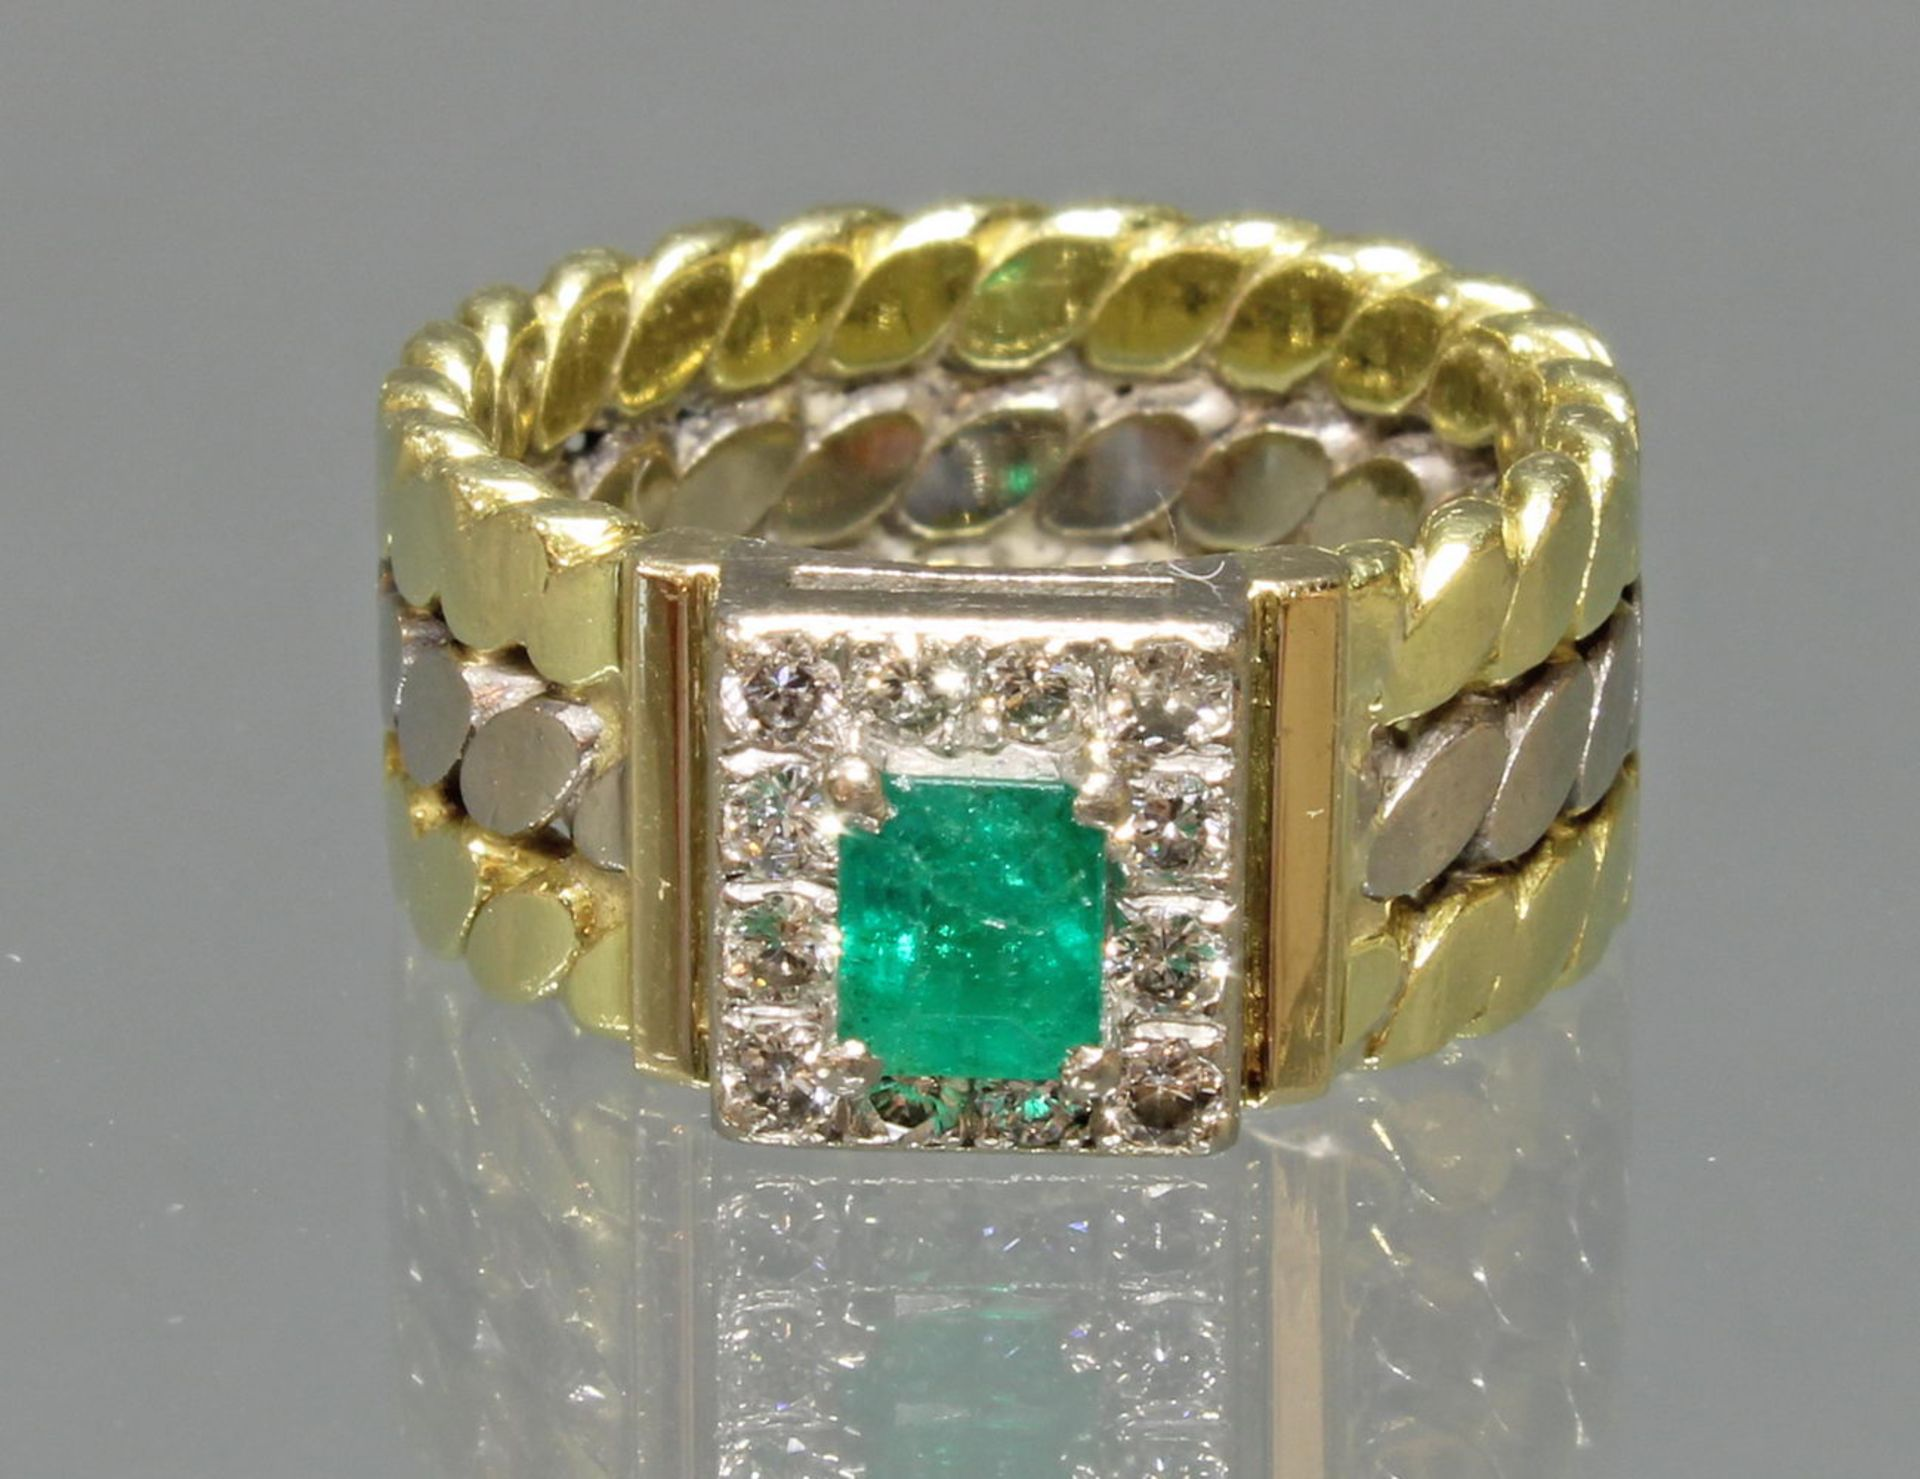 Ring, WG/GG 750, 1 rechteckig facettierter Smaragd (Haarriss) ca. 0.52 ct., 12 Brillanten zus. ca.